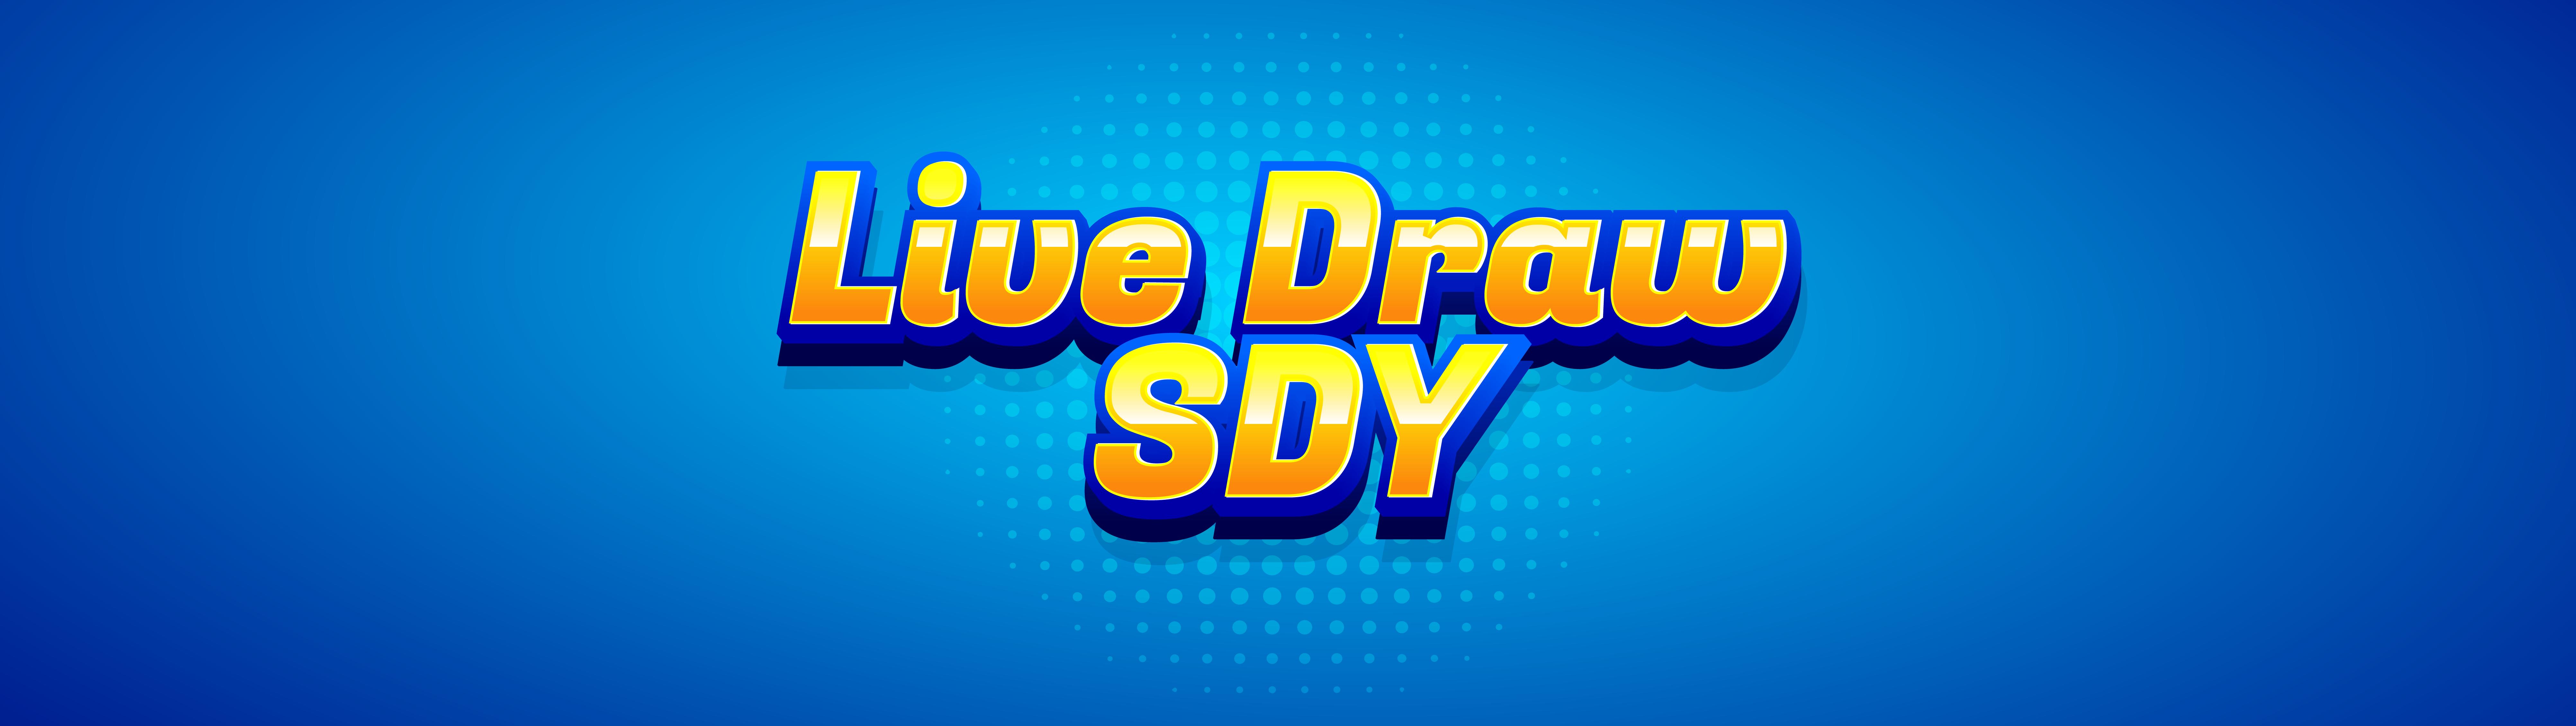 Live Draw SDY - Live Sydney Pools